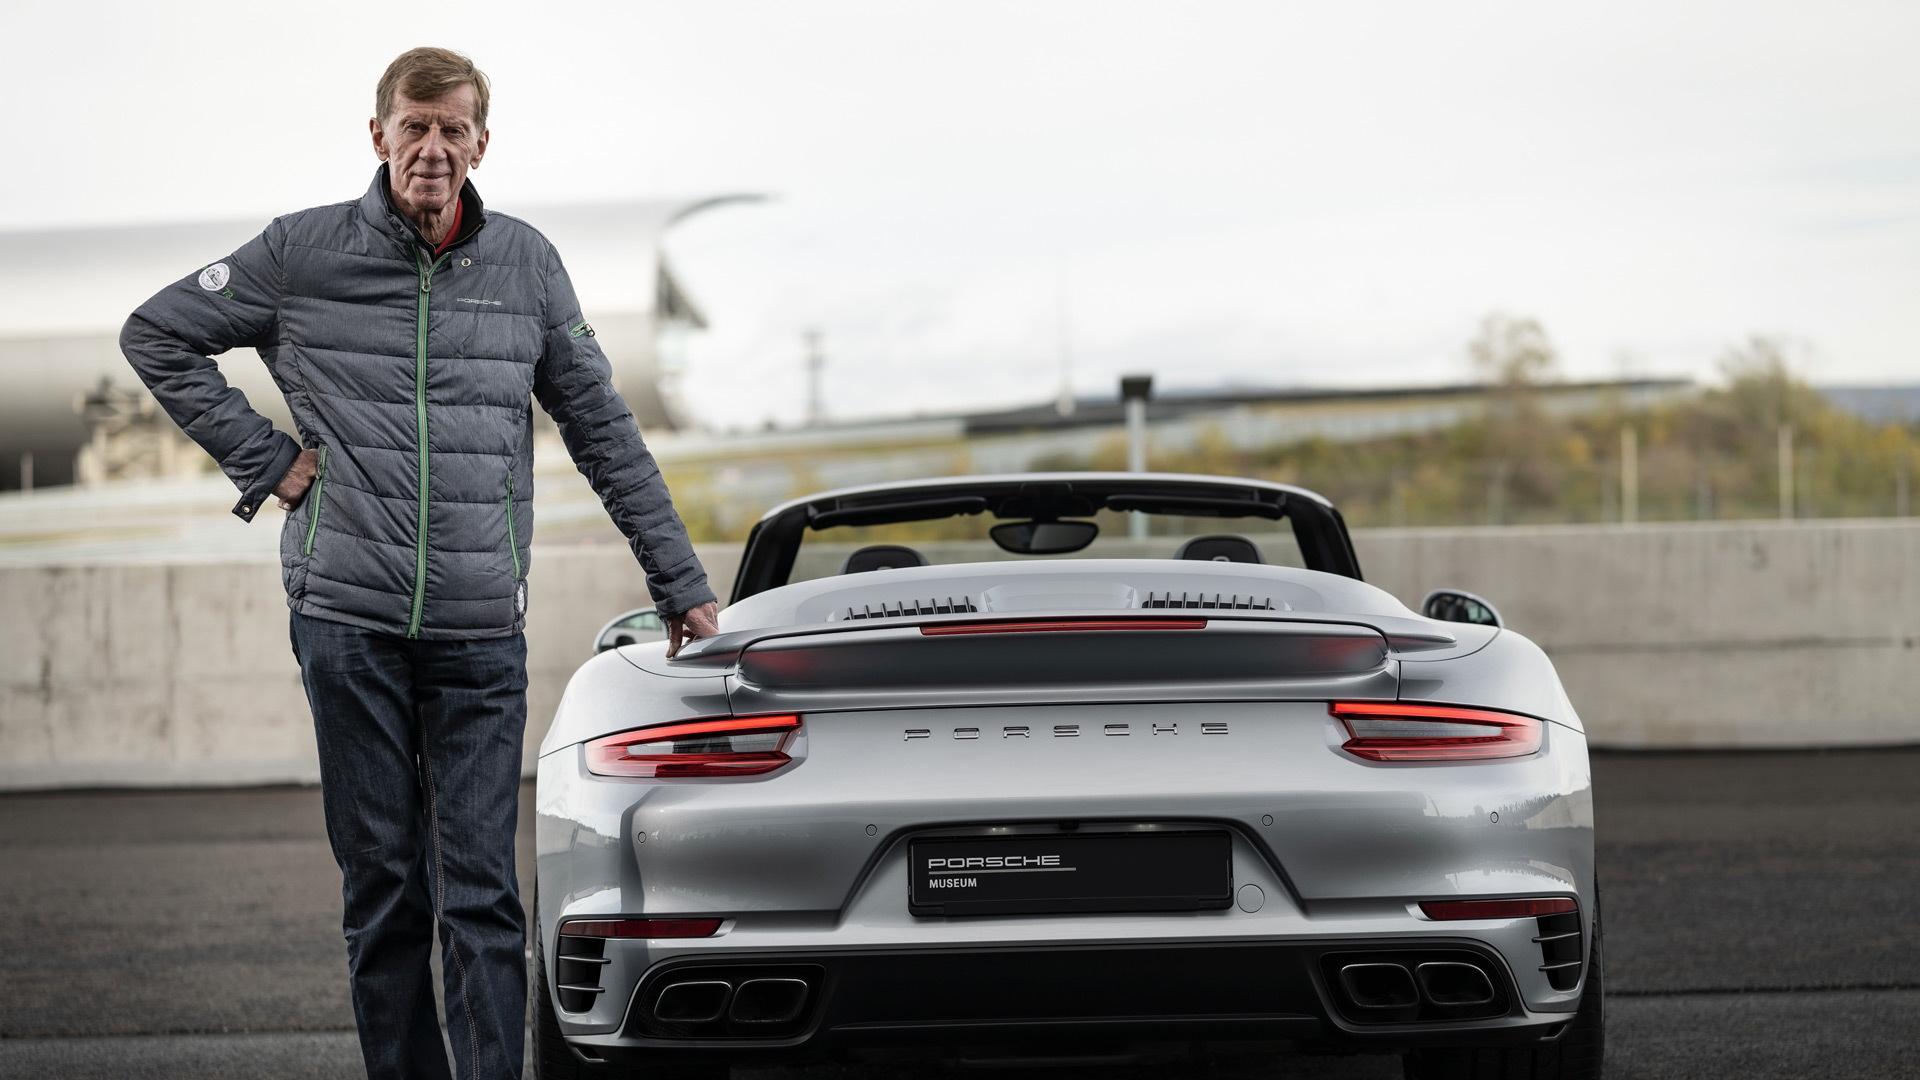 Walter Röhrl and the 991-generation Porsche 911 Turbo